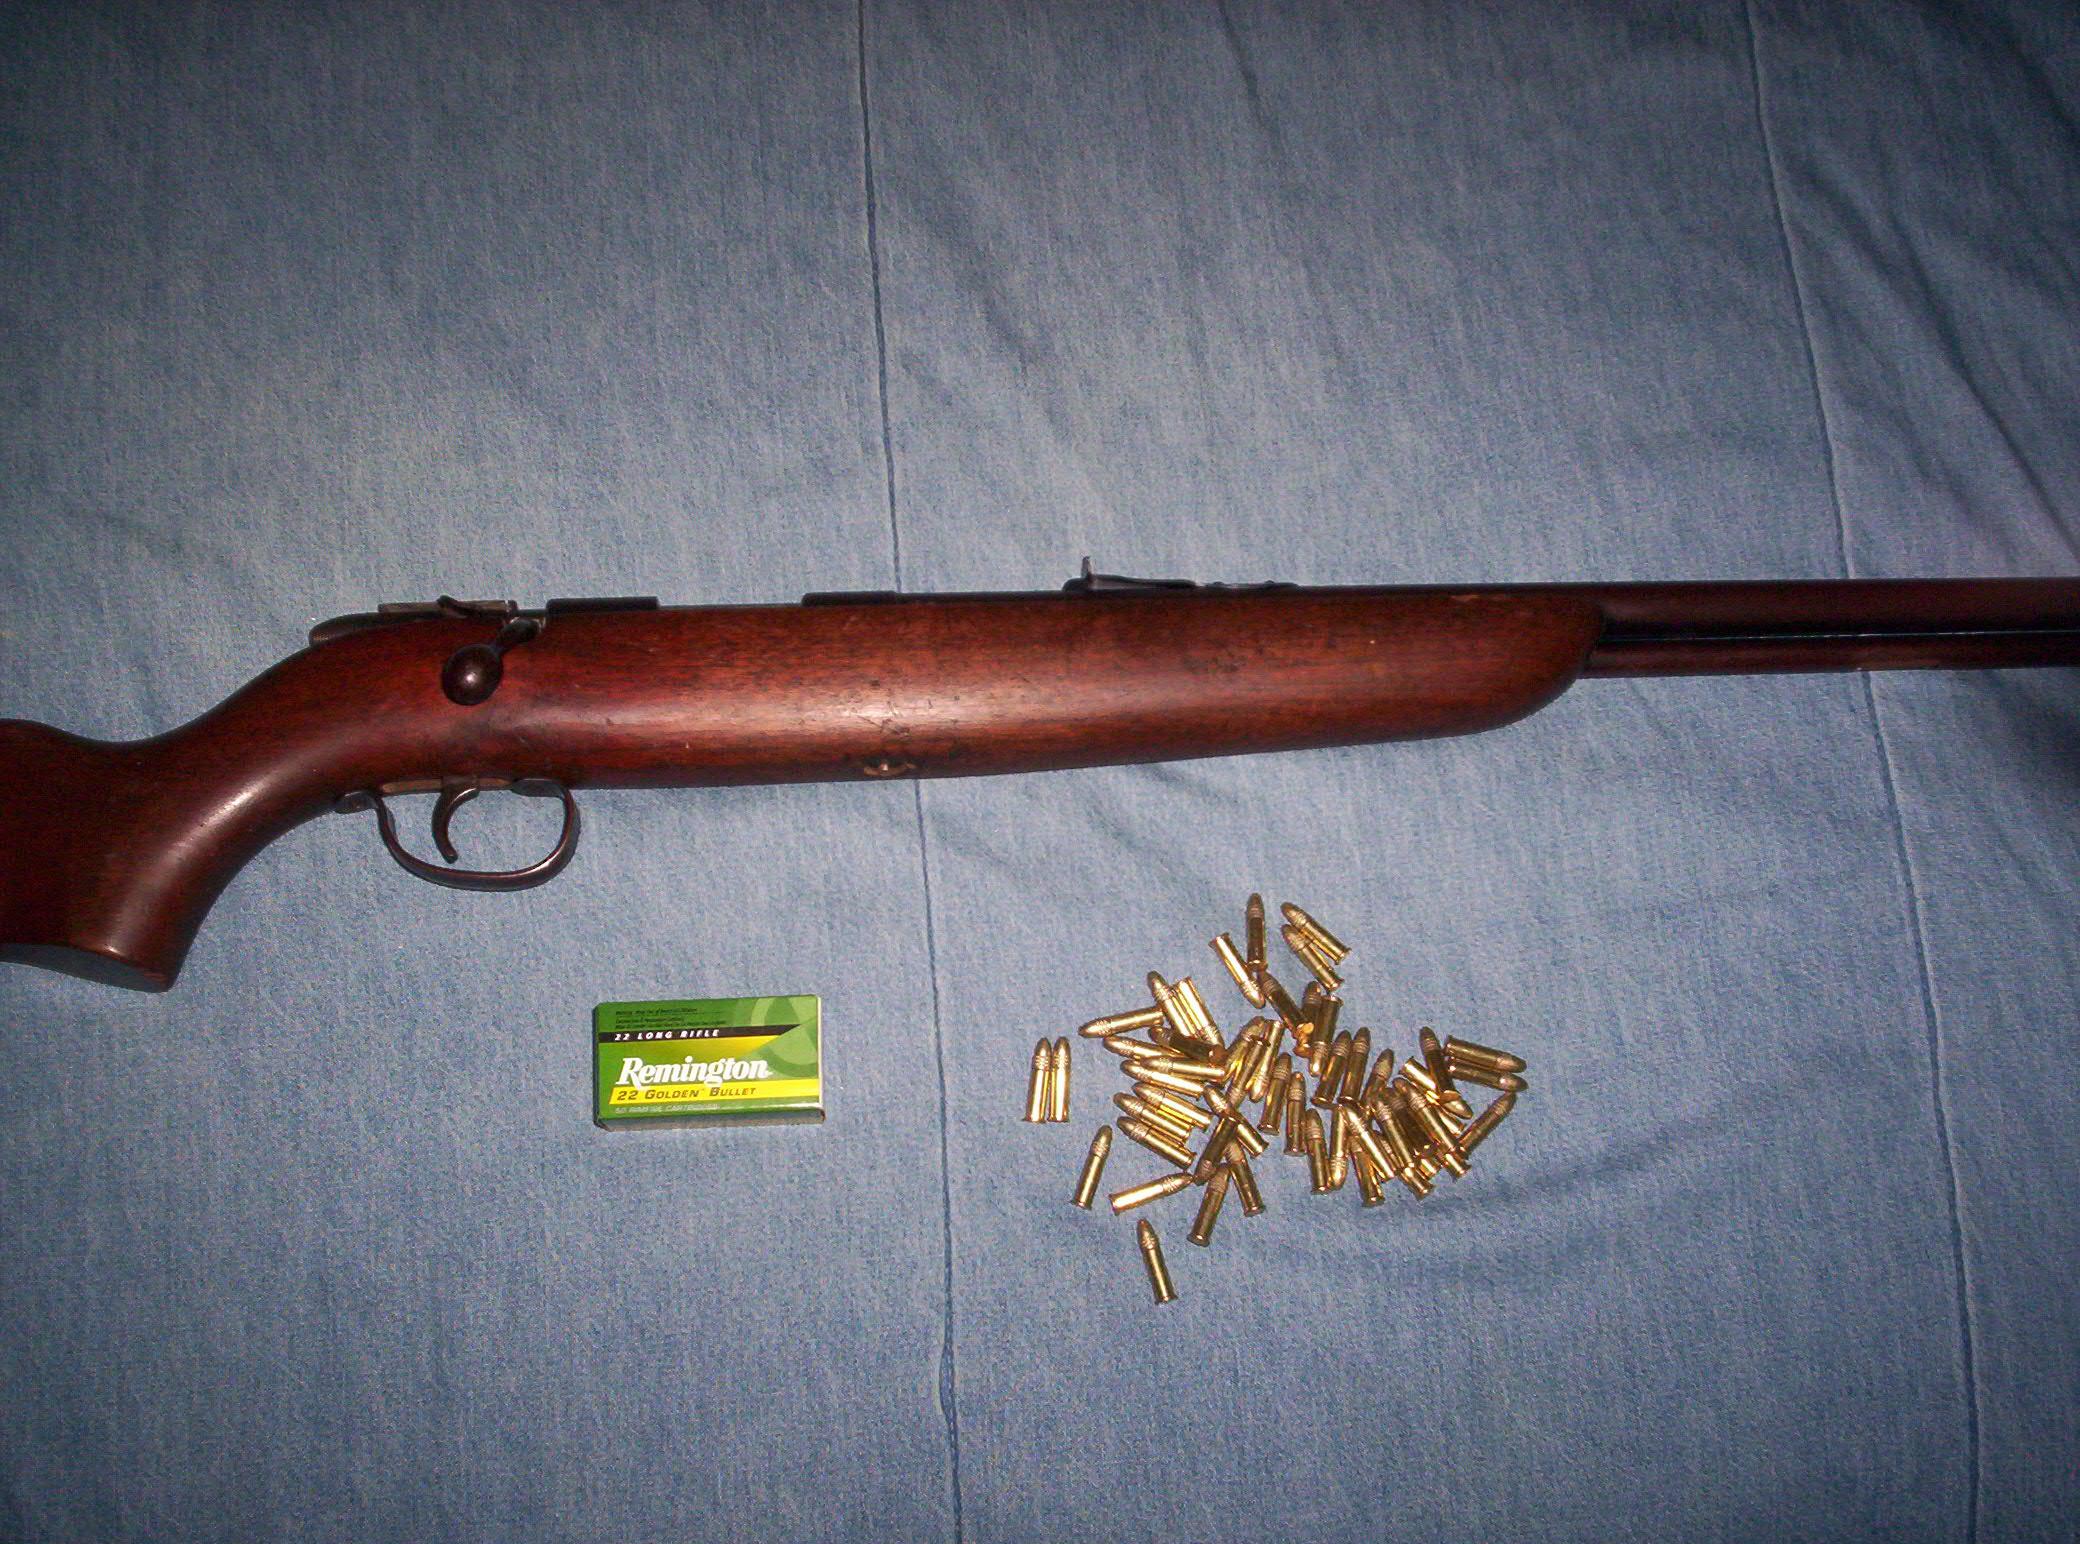 Remington Model 512 Sportsmaster - Wikipedia on